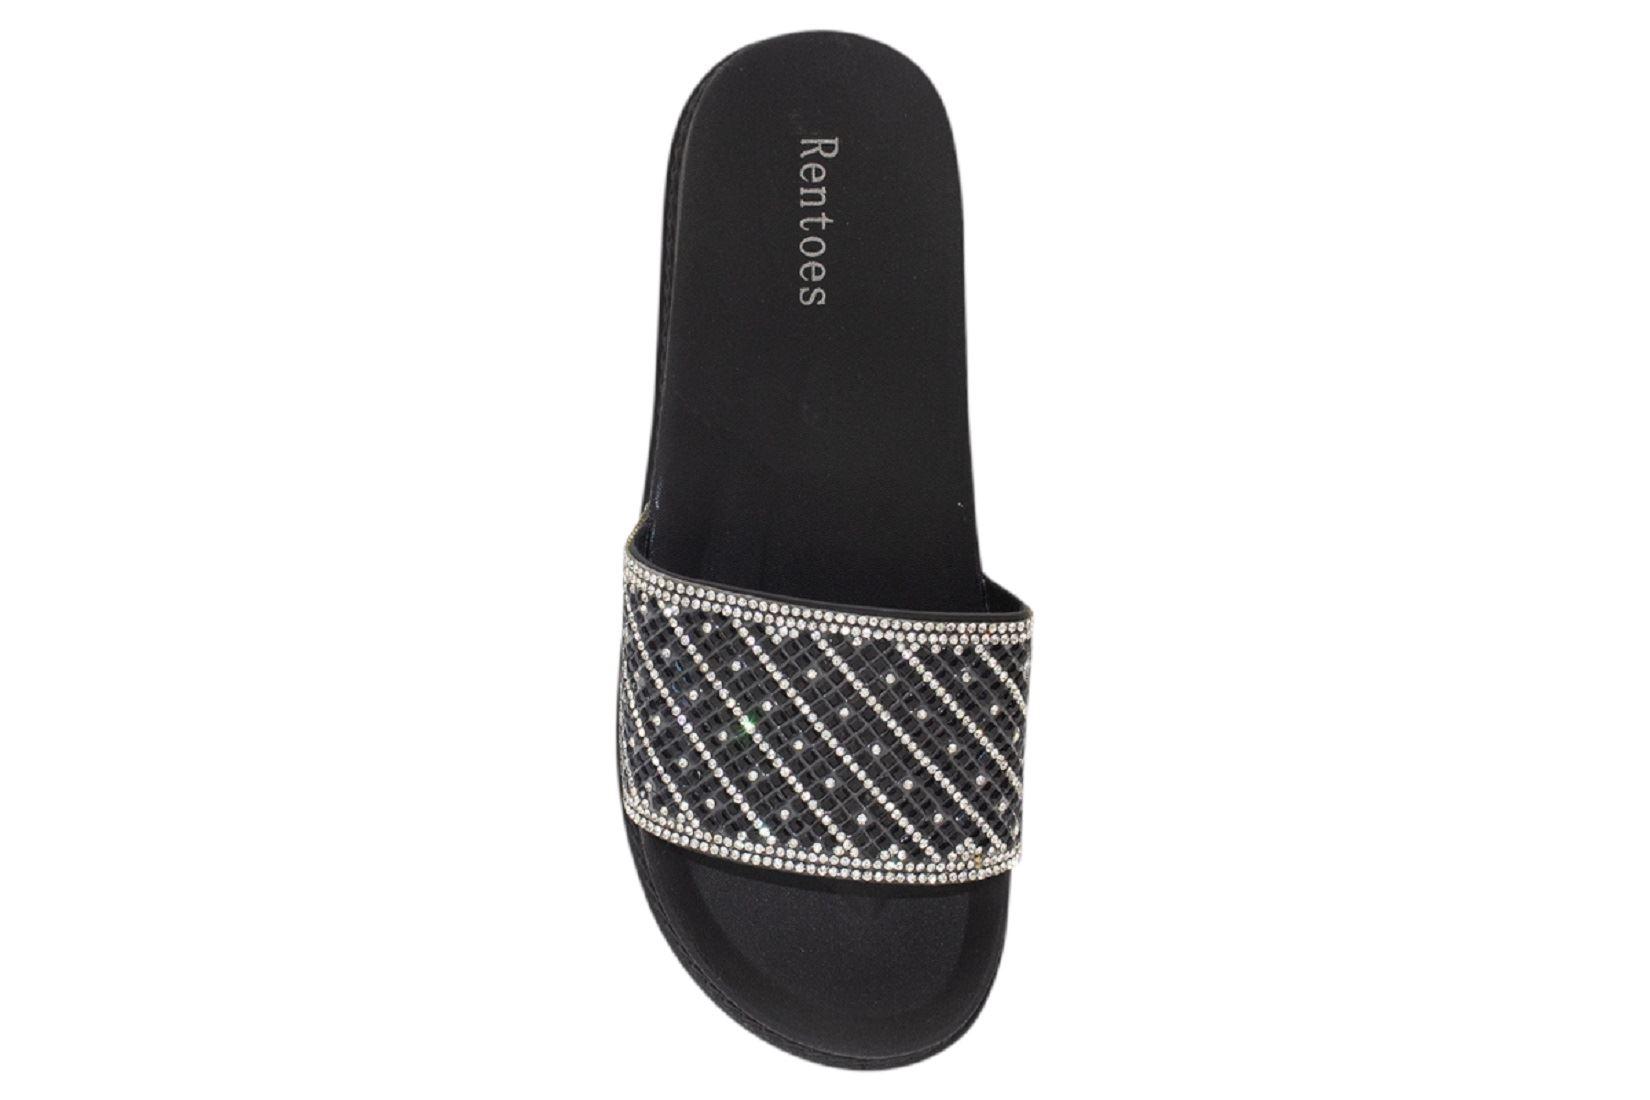 Womens-Sliders-Casual-Slippers-Mules-Ladies-Diamante-Flip-Flop-Sandals-Shoes thumbnail 4